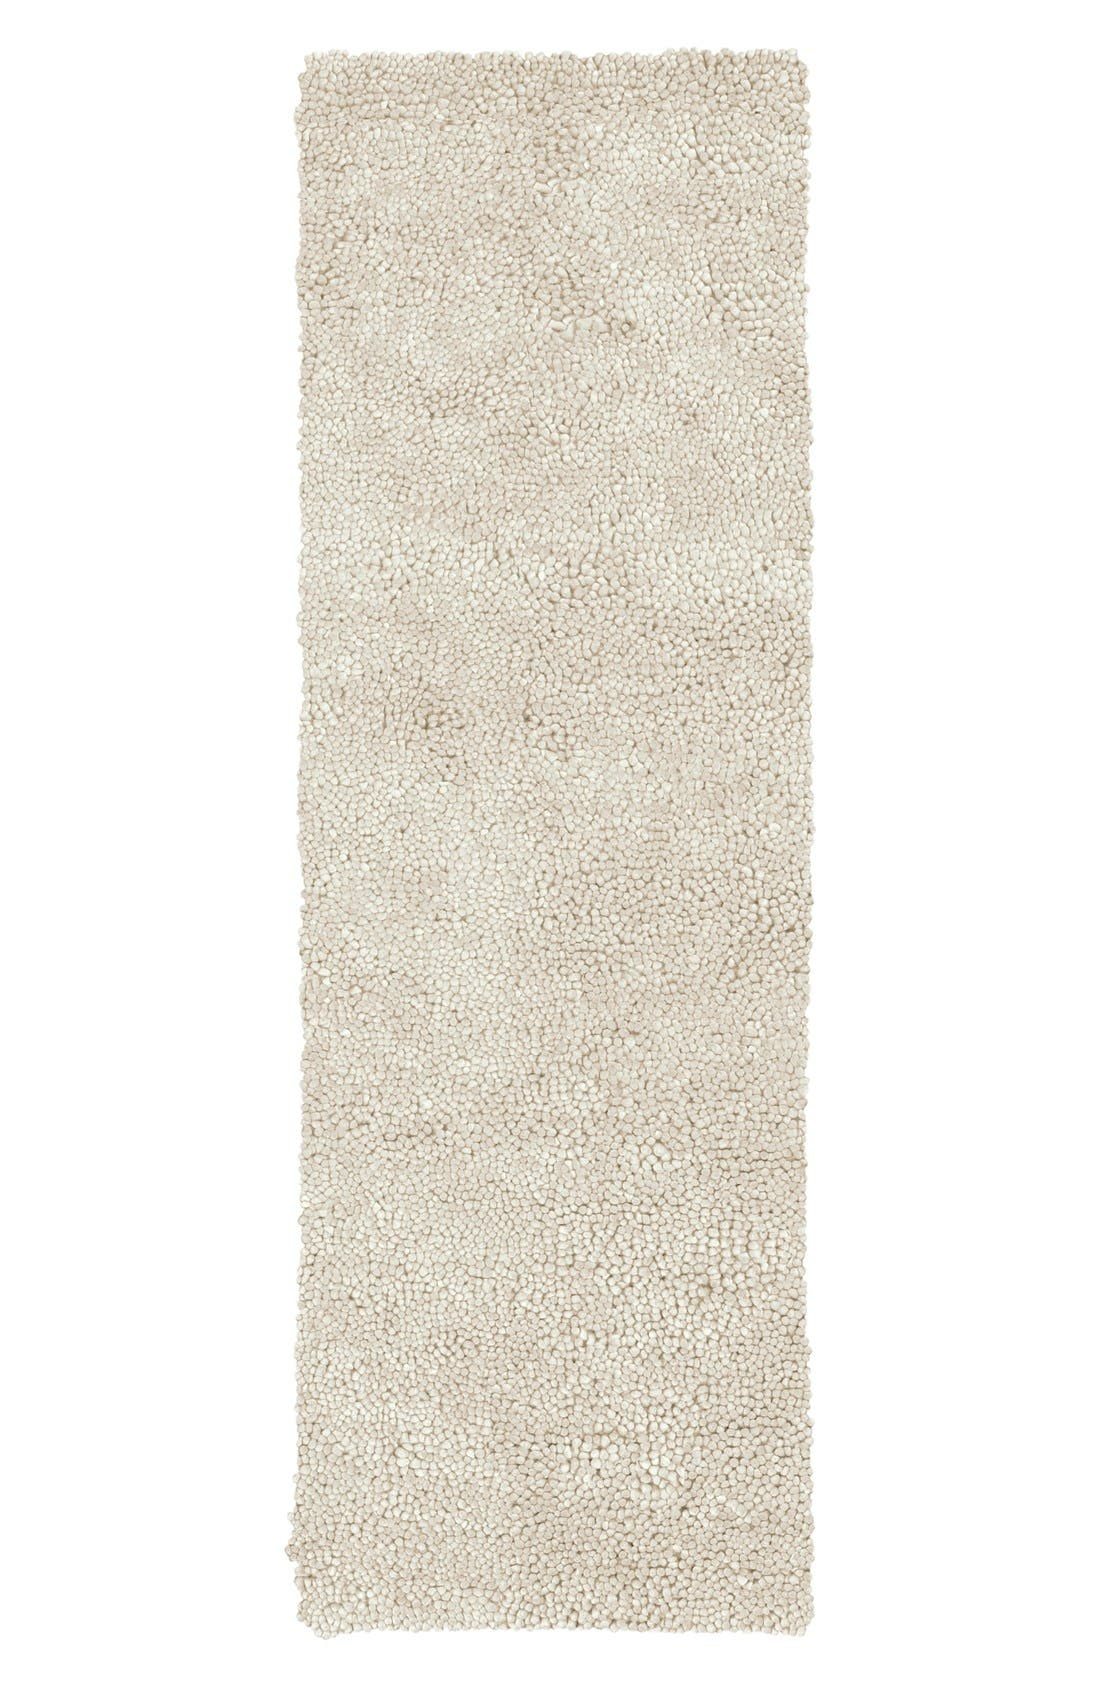 'Aros' Wool Rug,                             Alternate thumbnail 2, color,                             IVORY